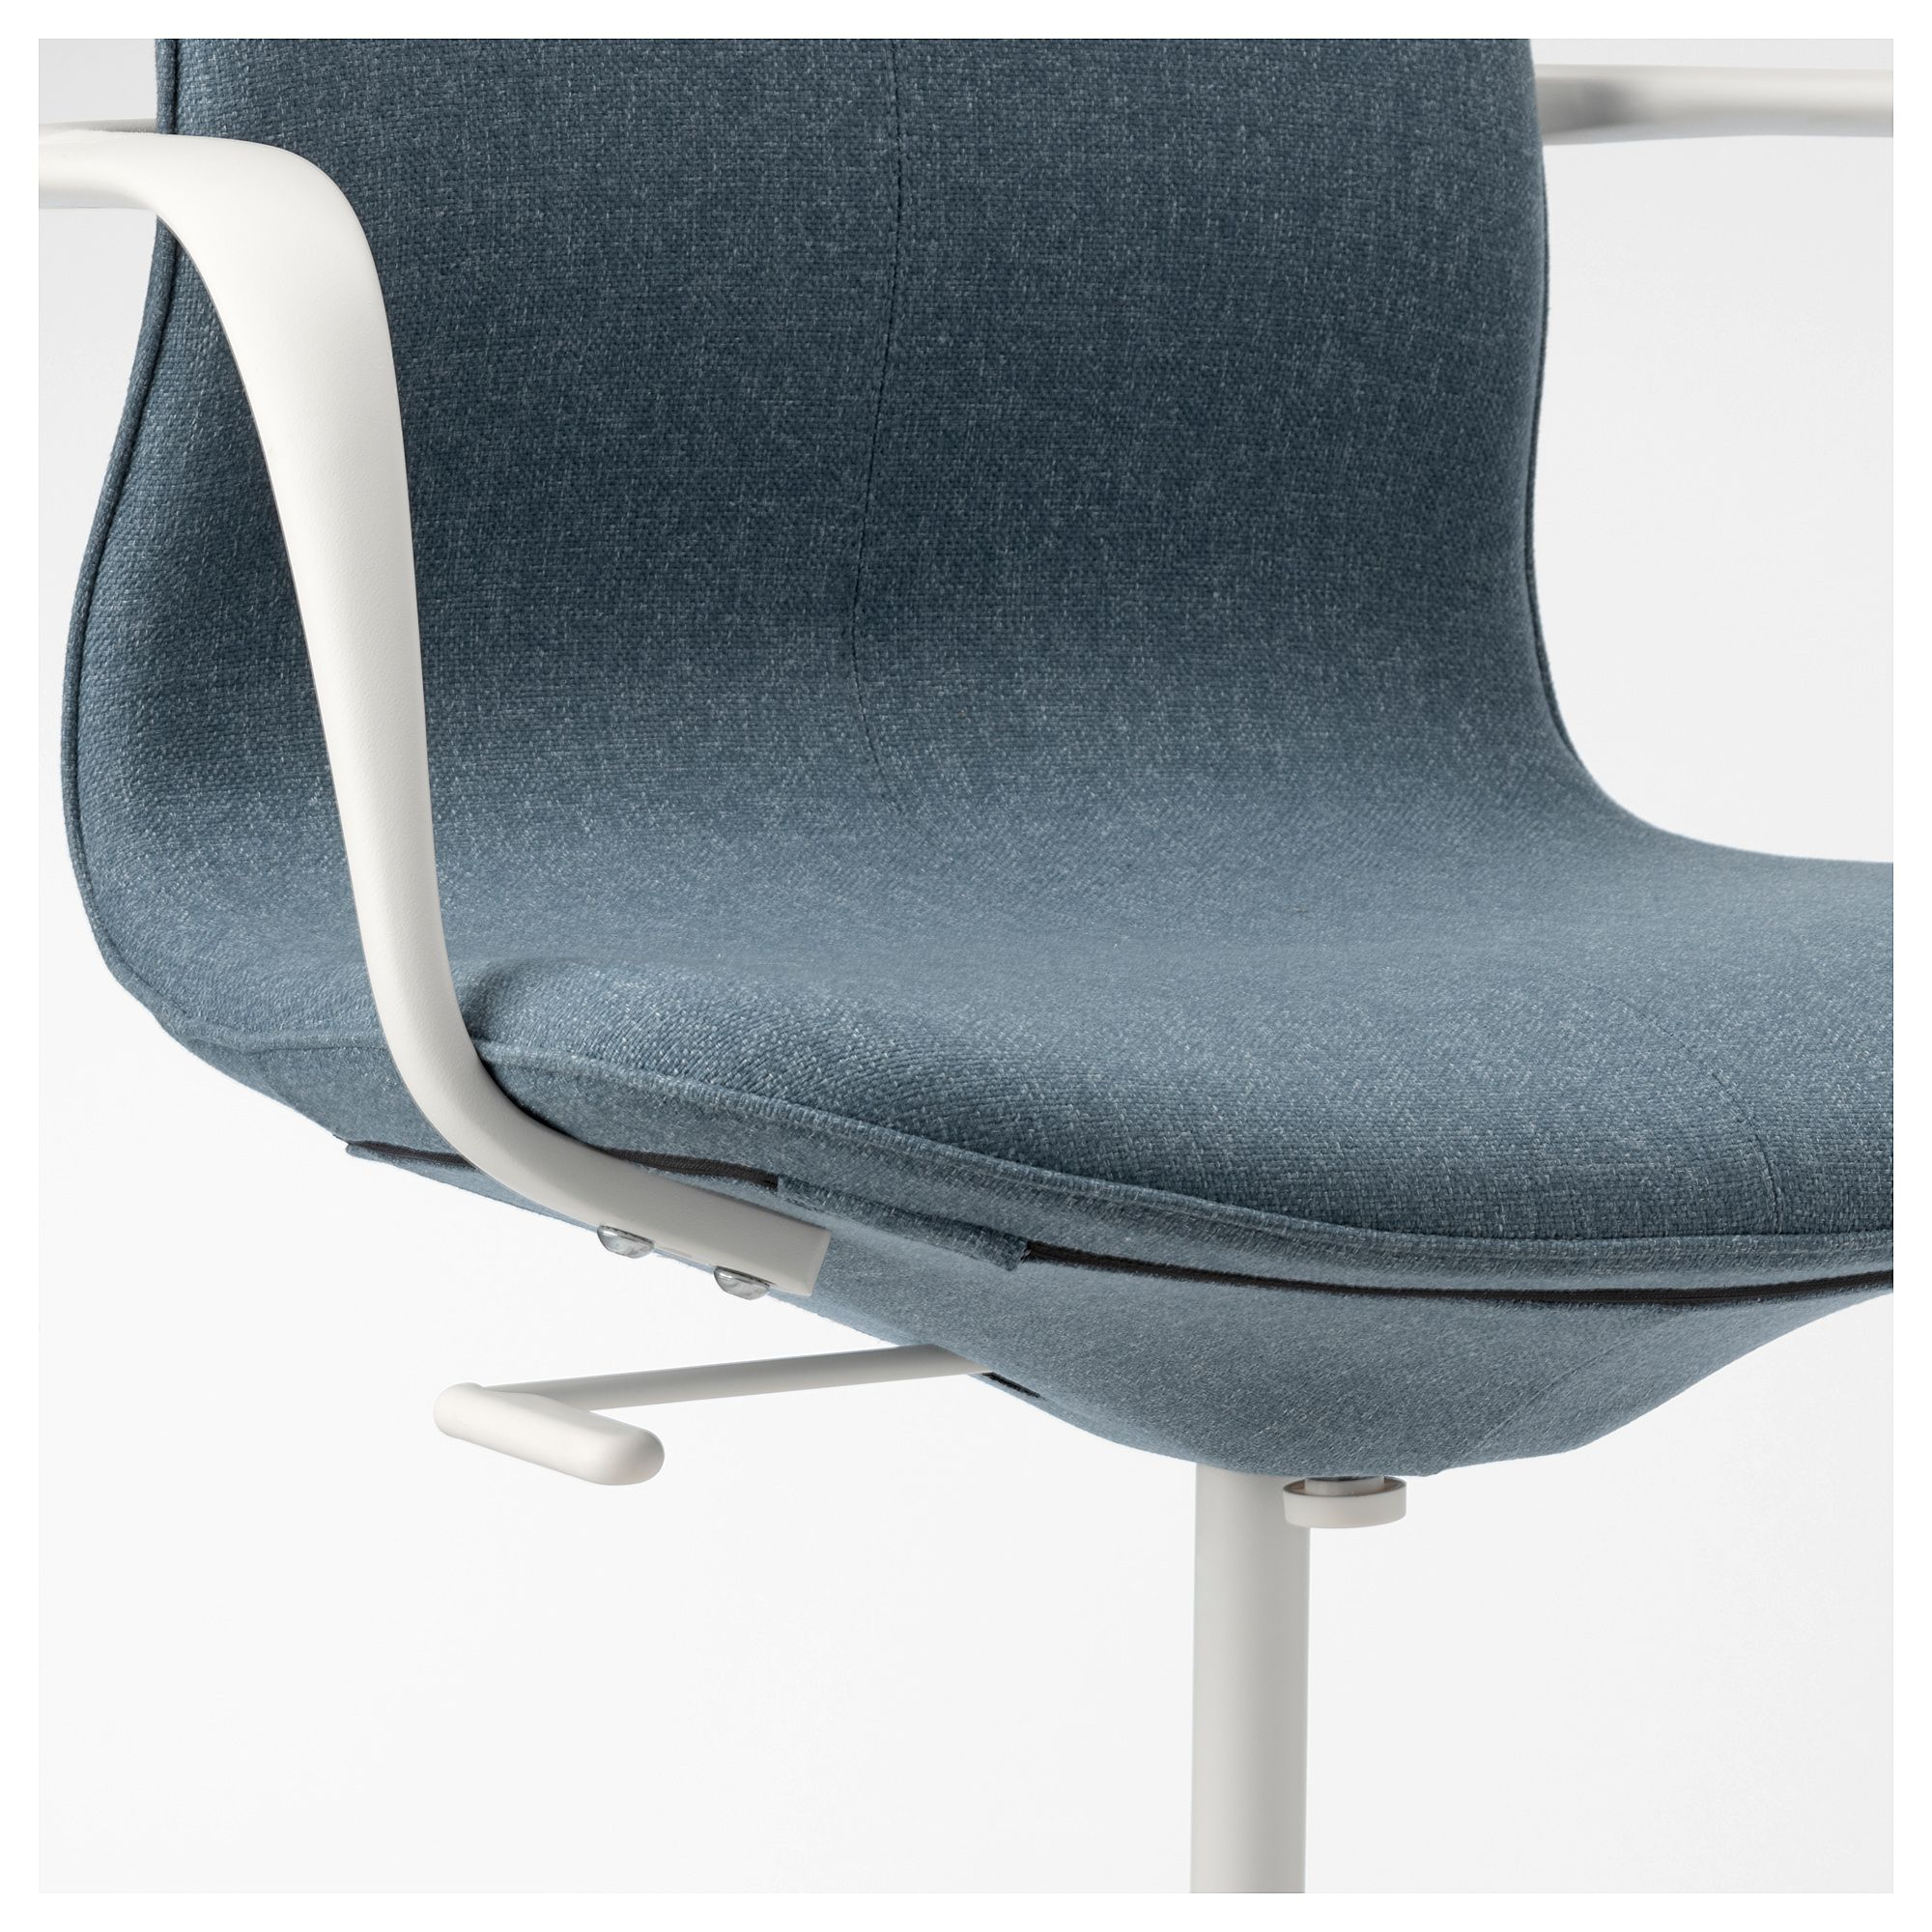 US Furniture and Home Furnishings | Chair, Ikea chair